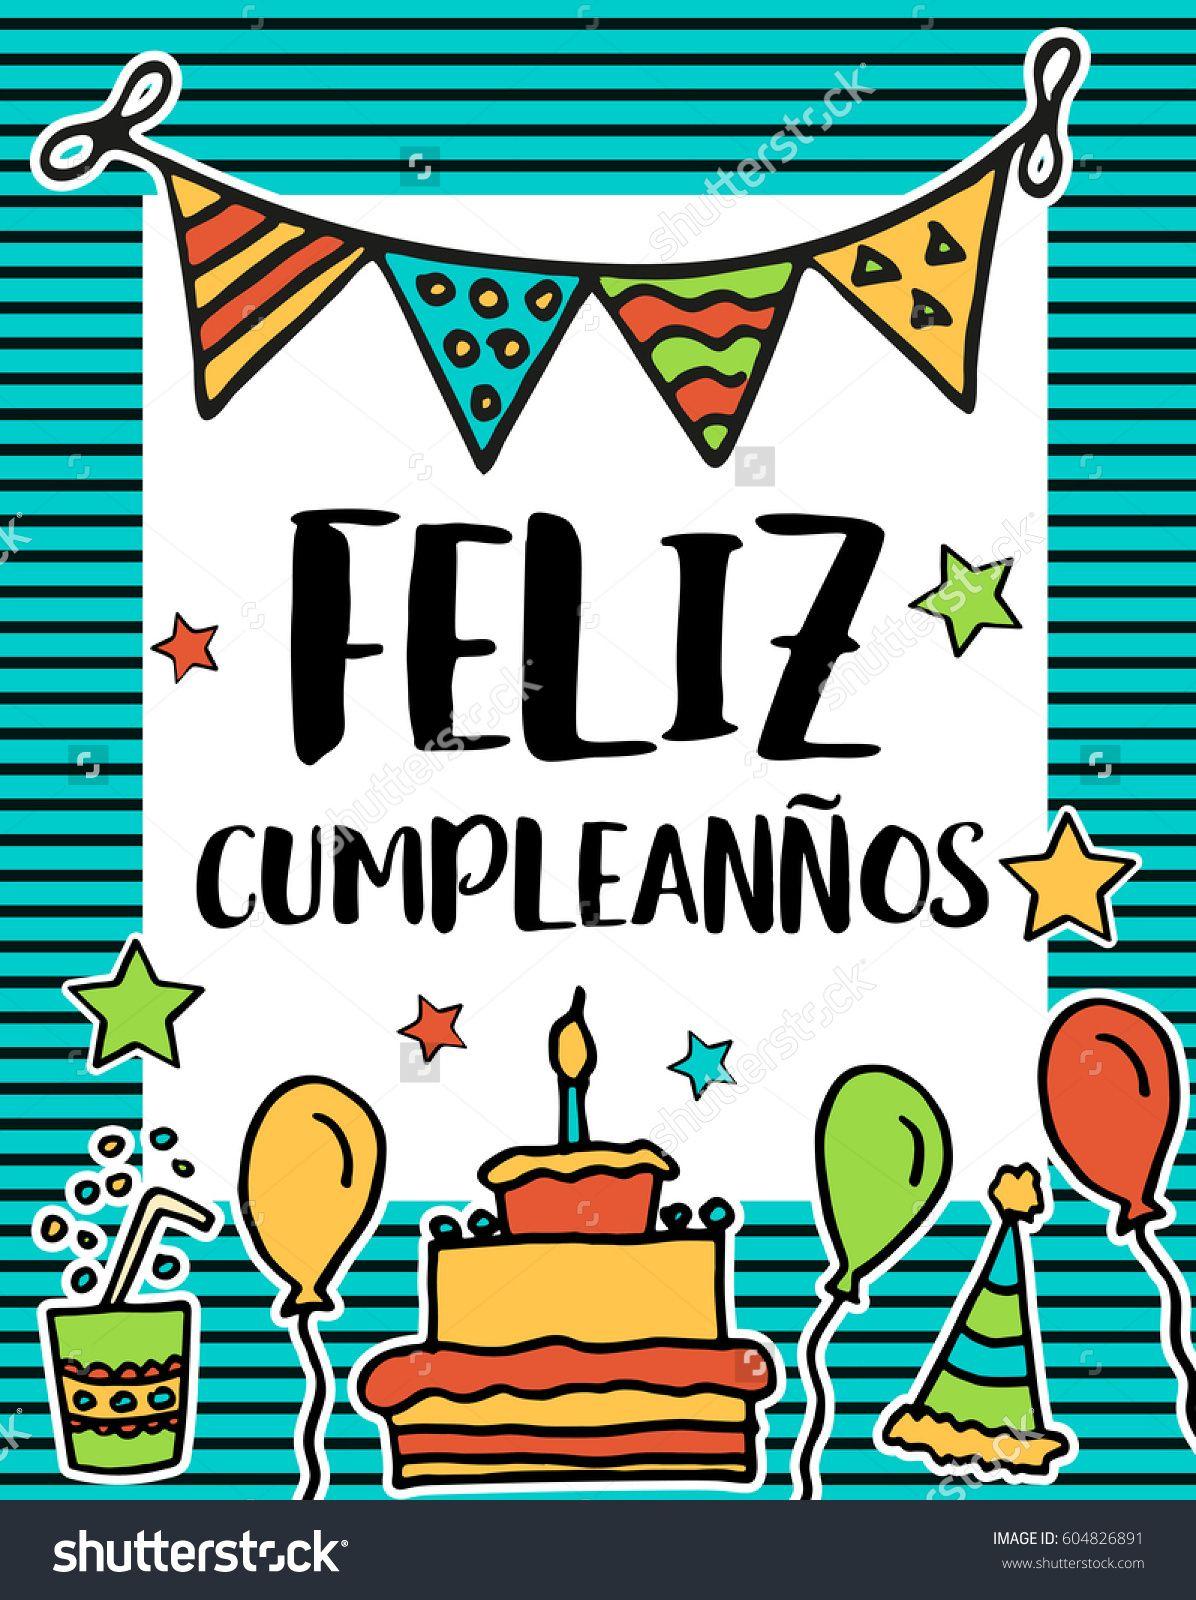 Feliz Cumpleanos Happy Birthday Greeting Written In Spanish